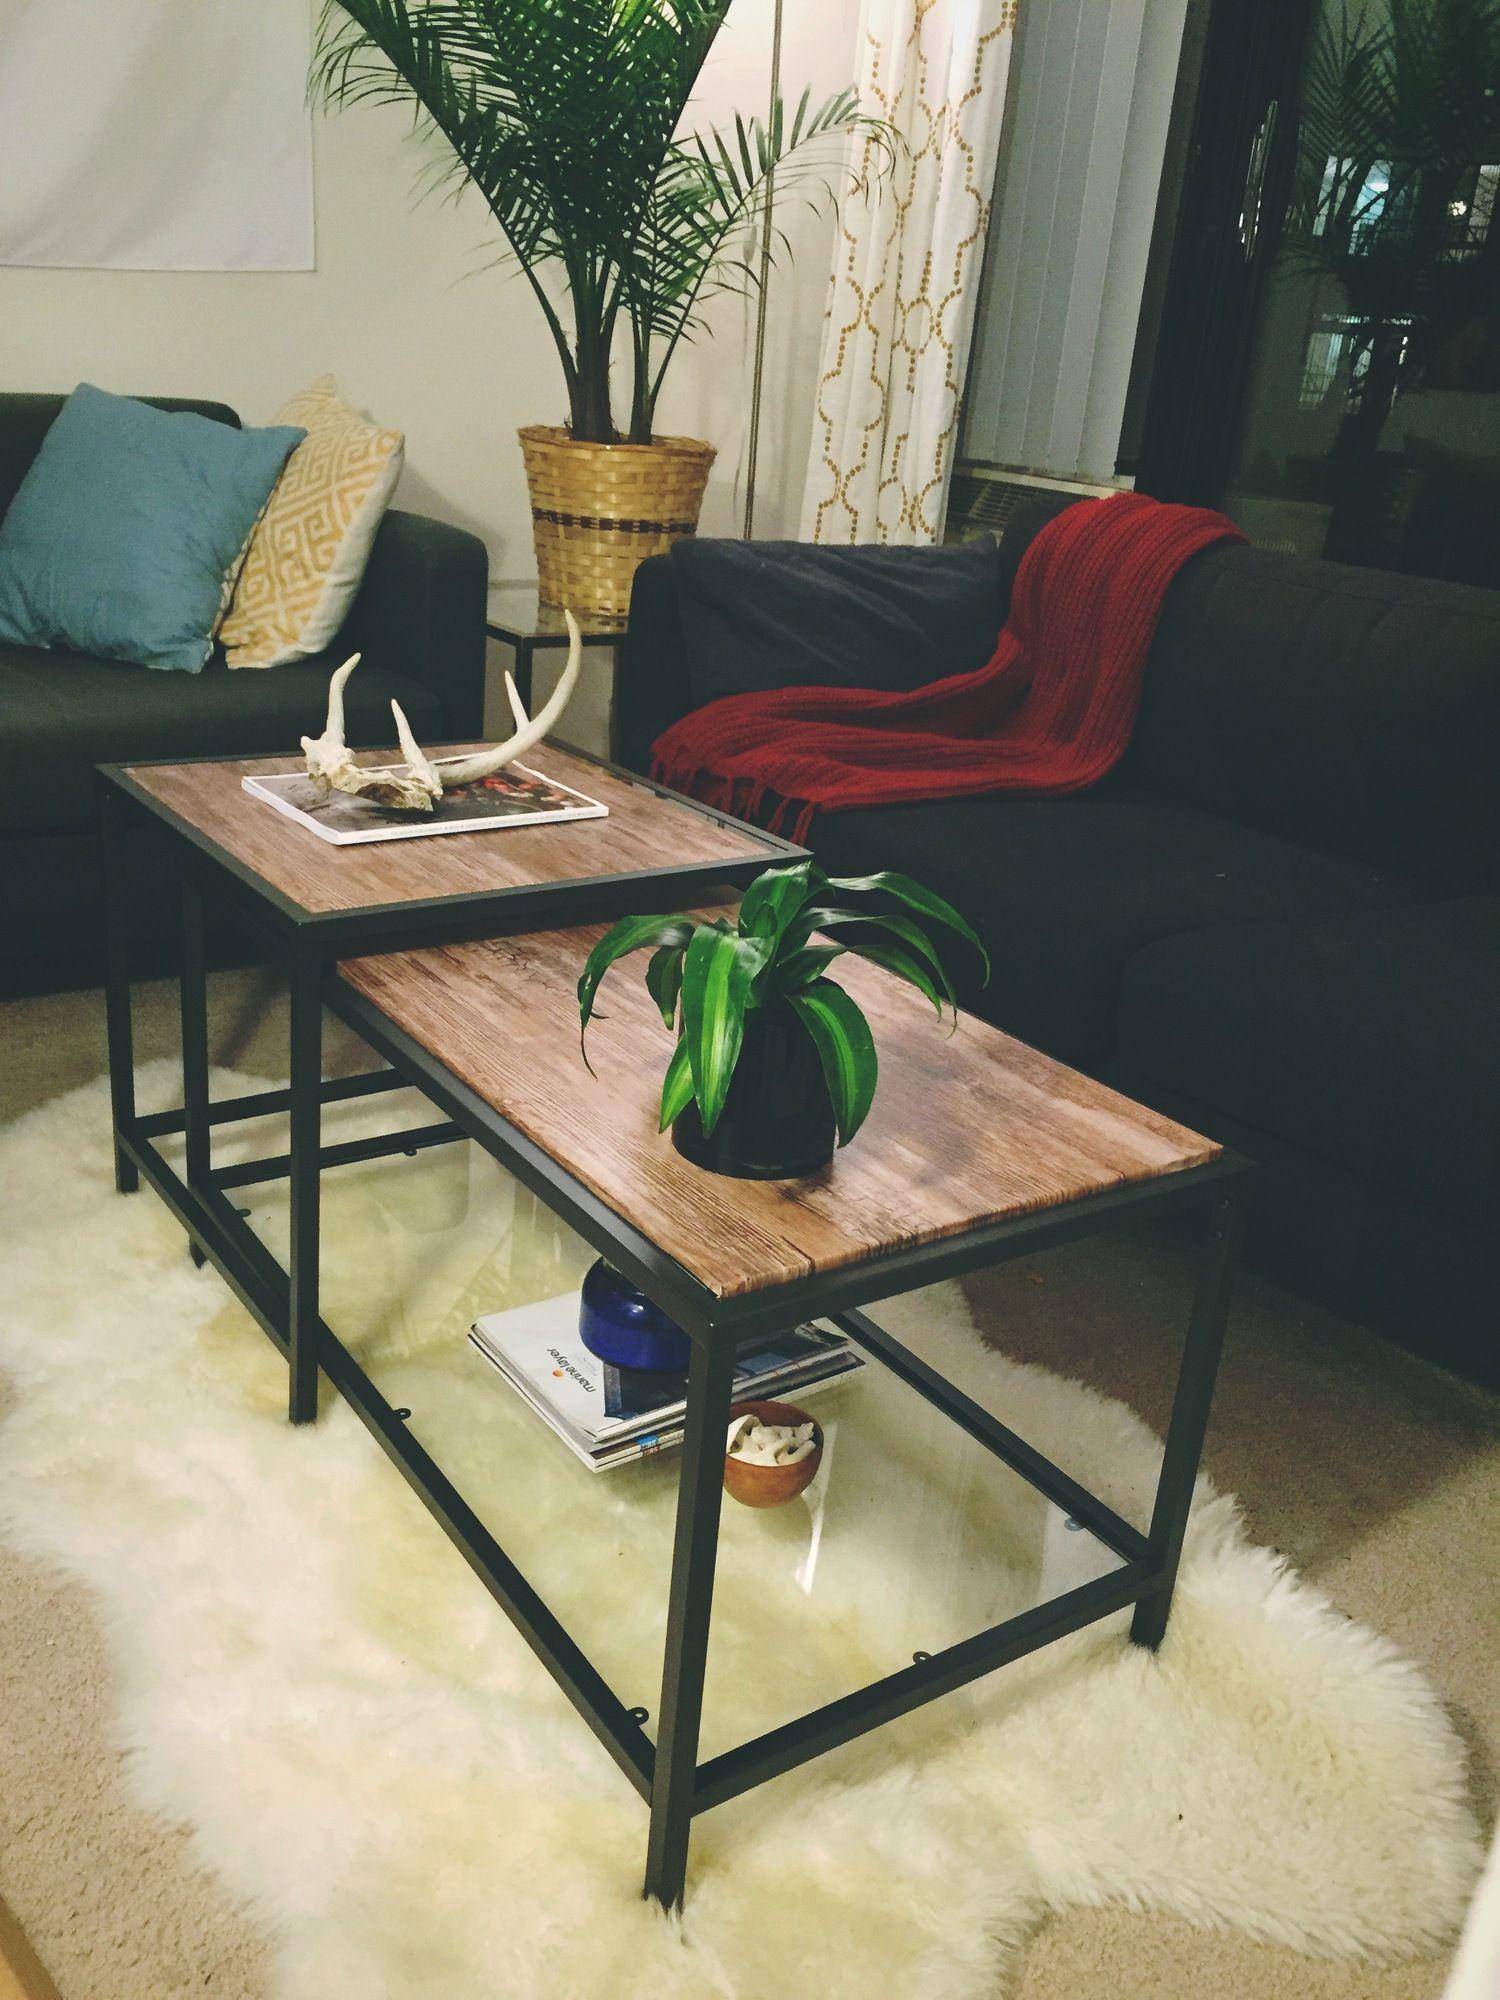 Rustic Nesting Coffee Table Hackpack Coffee Table Ikea Vittsjo Ikea Coffee Table